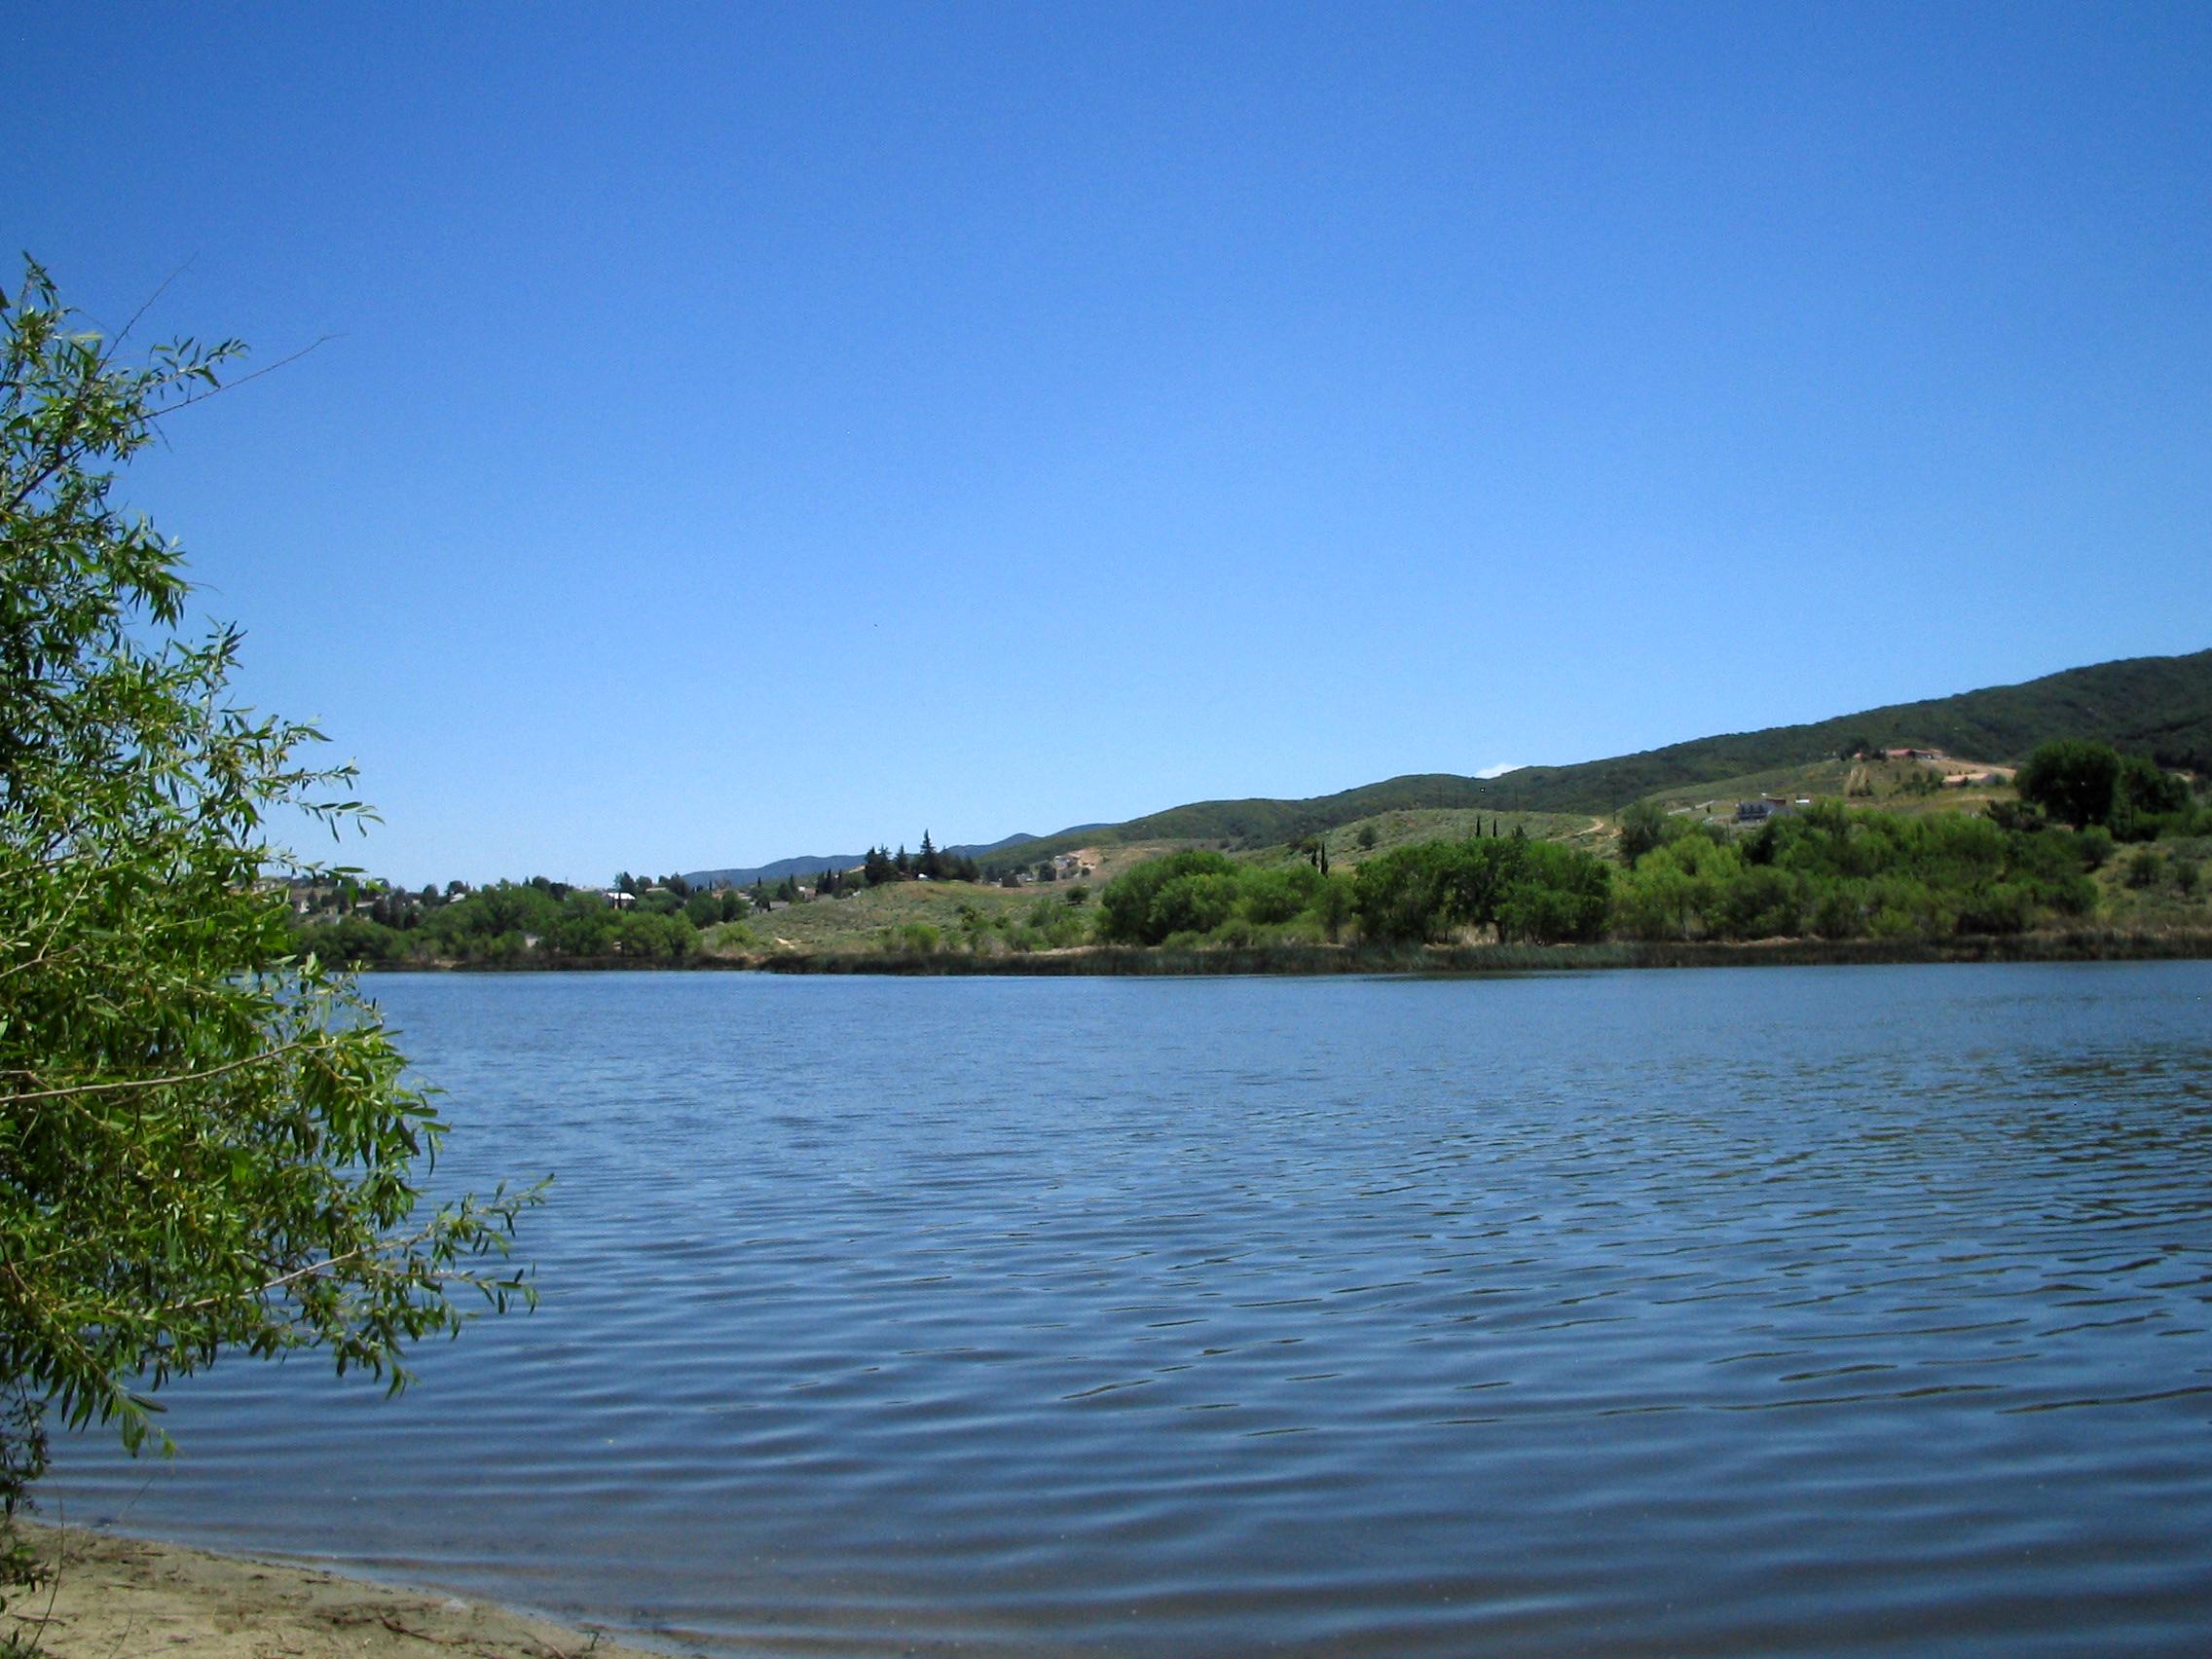 lake elizabeth ca map Elizabeth Lake Los Angeles County California Wikipedia lake elizabeth ca map